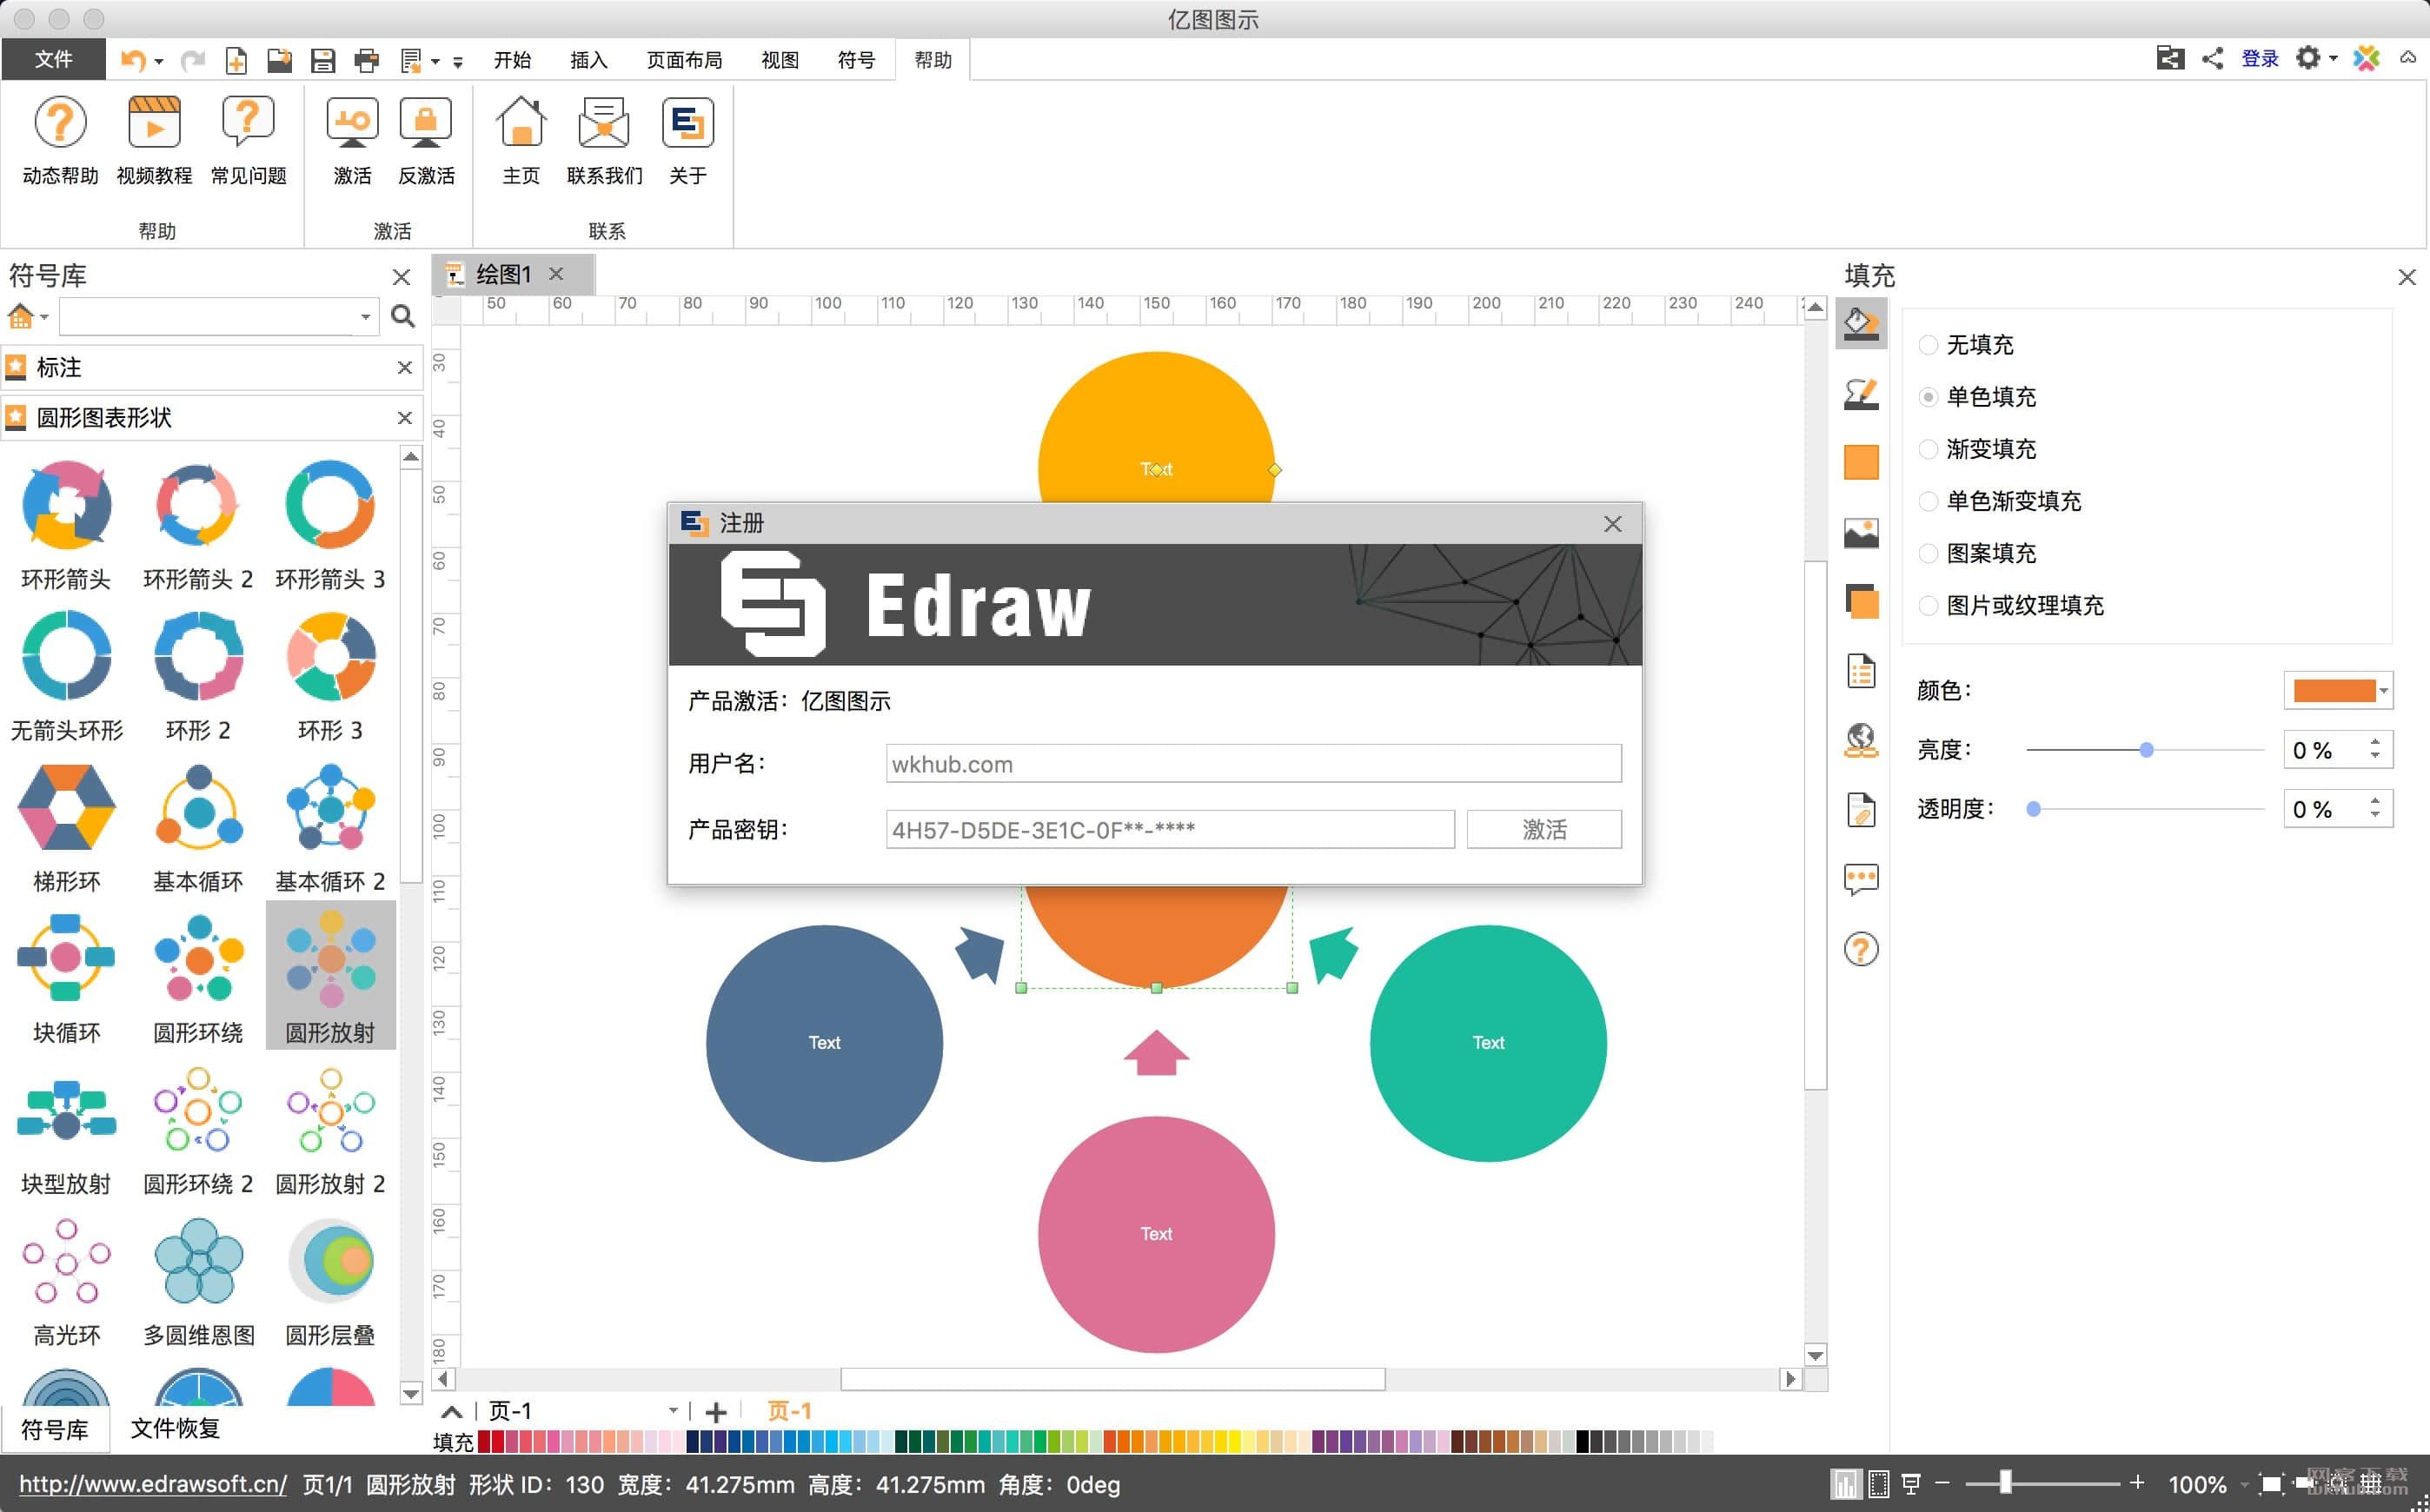 EdrawMax 9.3 基于矢量的绘图工具